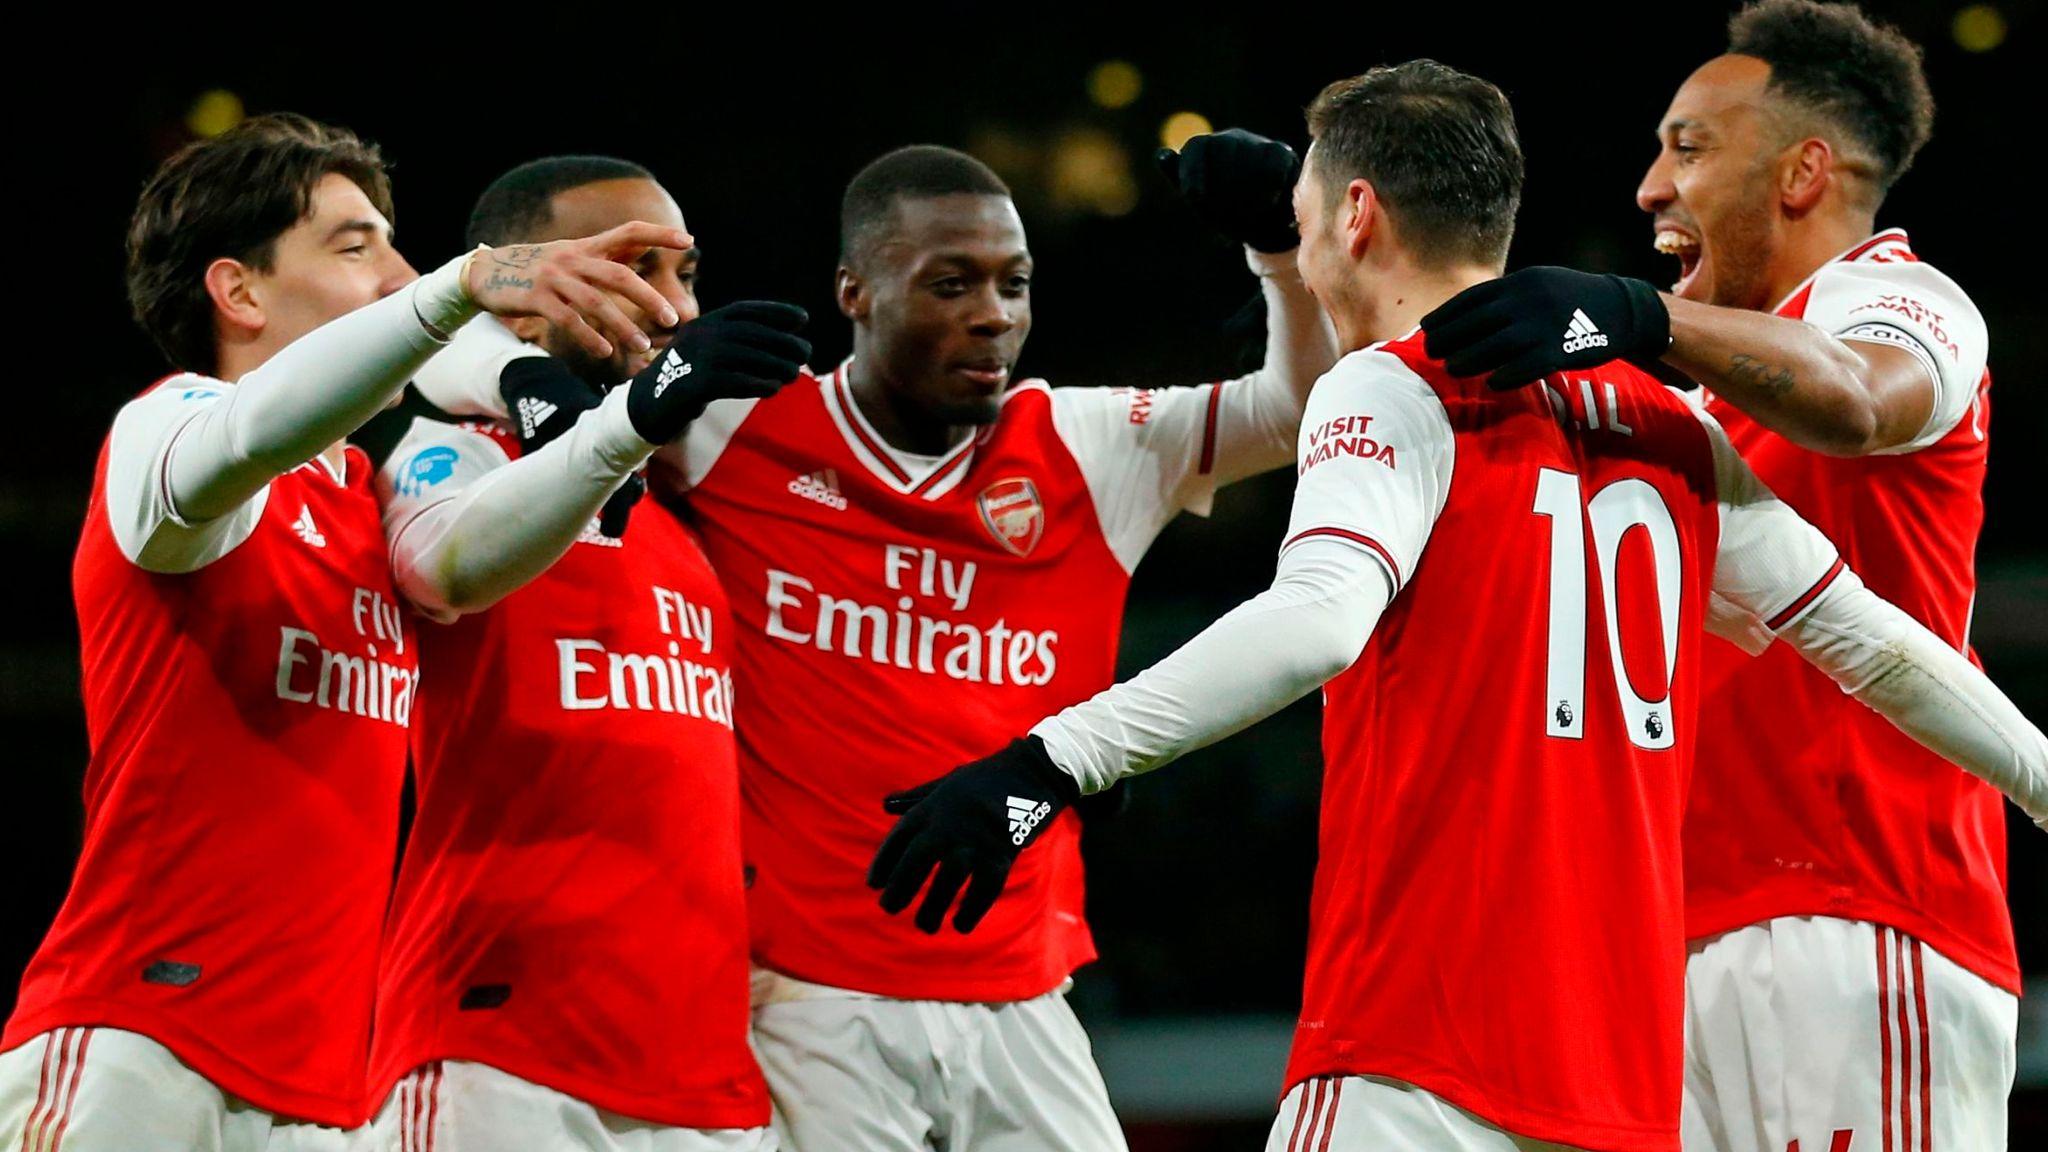 Arsenal 4 0 Newcastle Mesut Ozil And Alexandre Lacazette Score At Emirates Football News Sky Sports